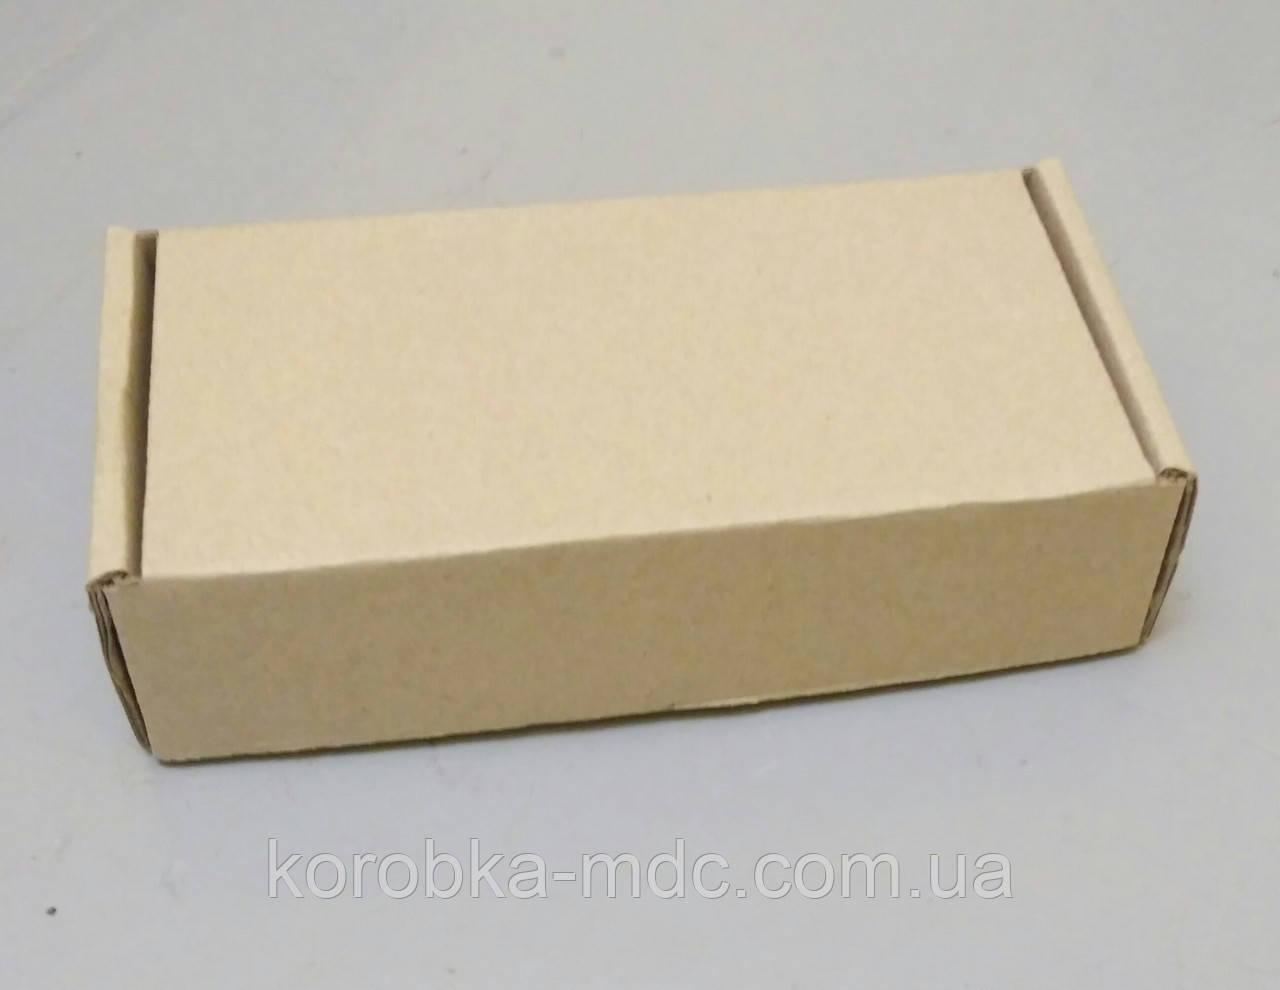 Коробка бурая 230х150х36 самосборная (шкатулка)